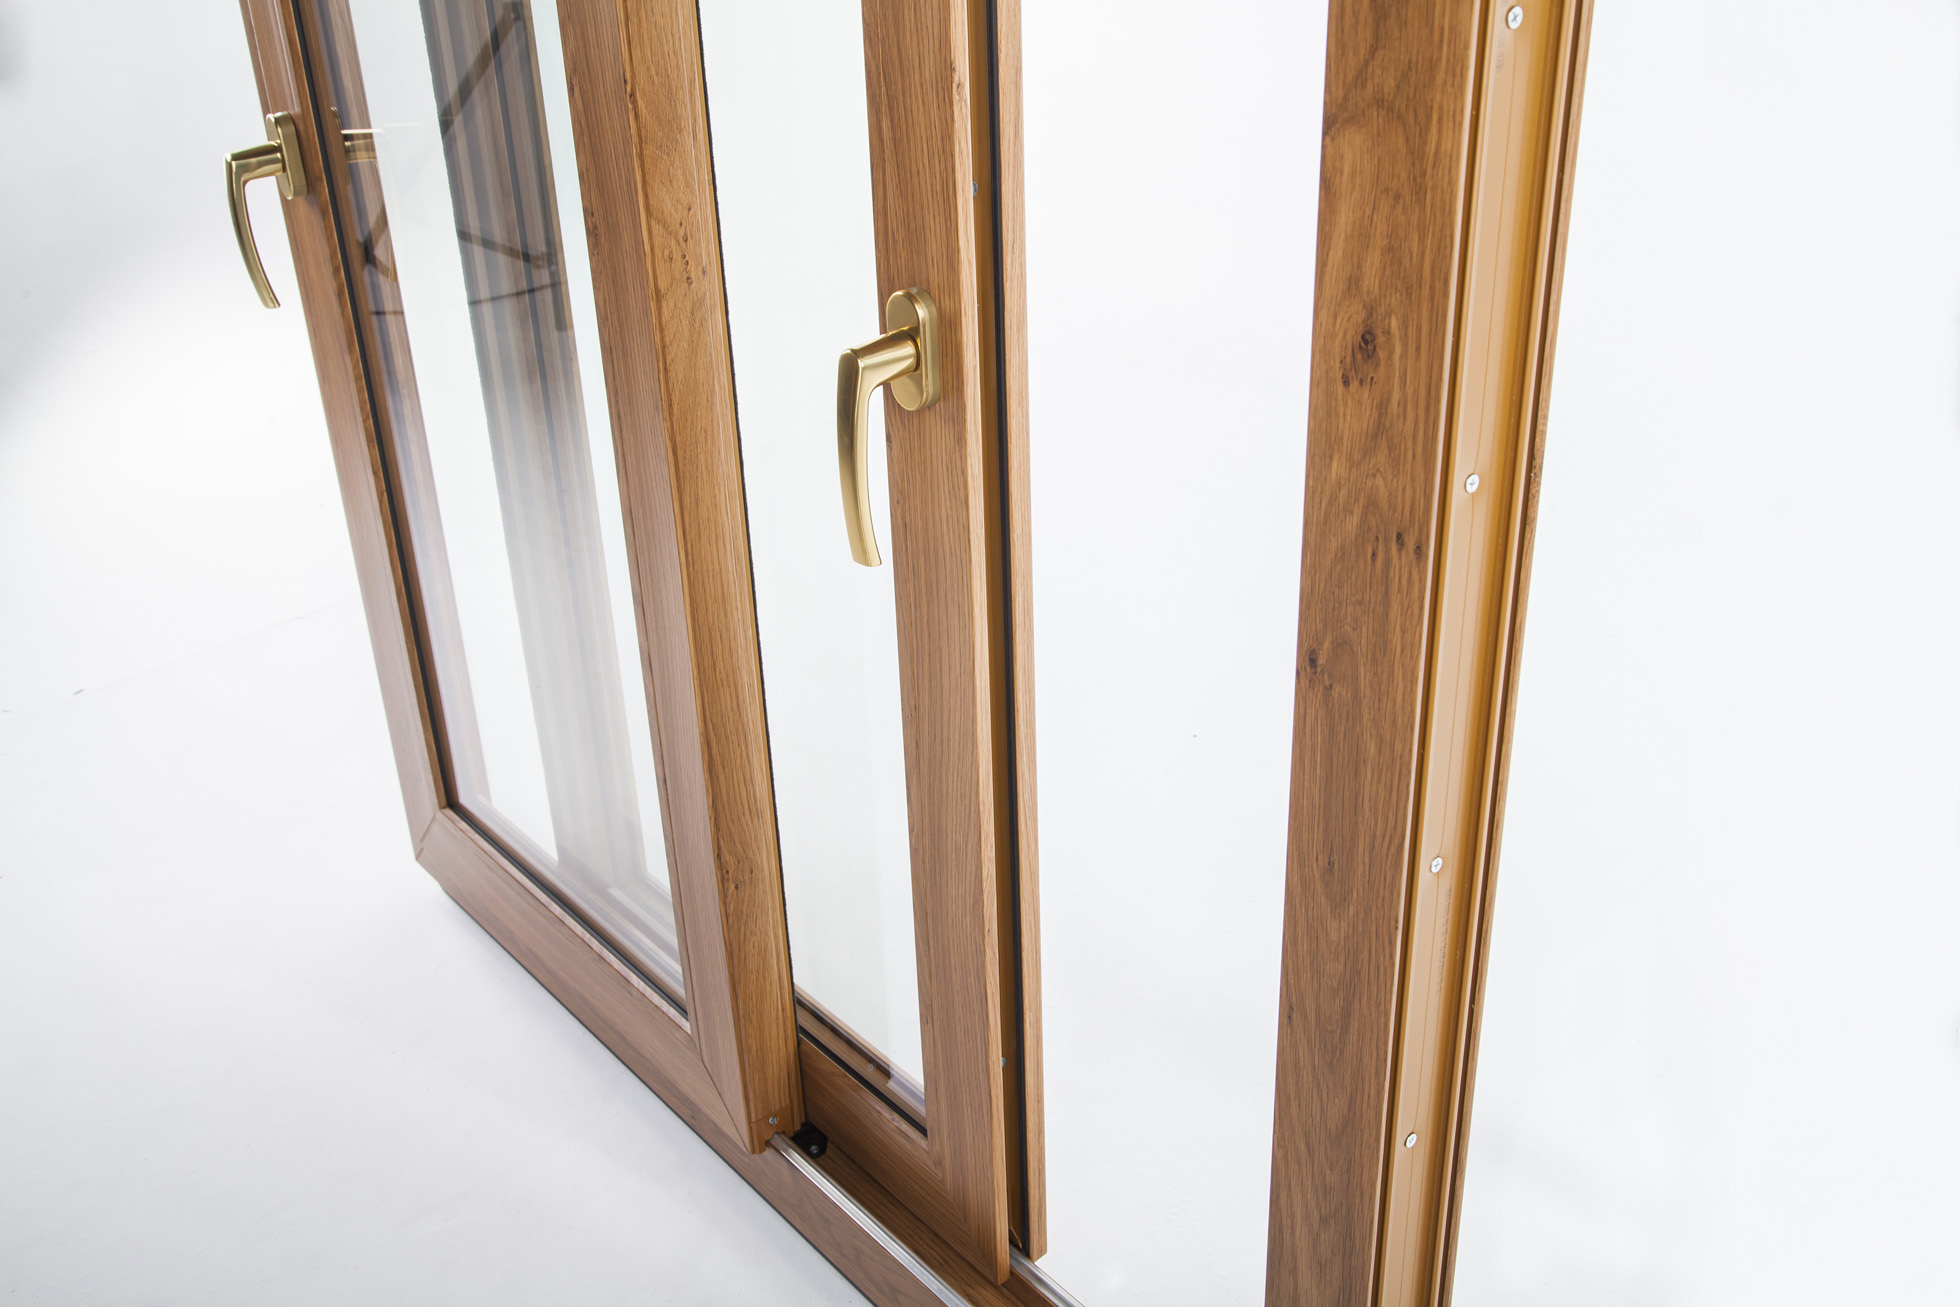 Okna Samoraj porta finestra scorrevole parallelo in pvc colore winchester